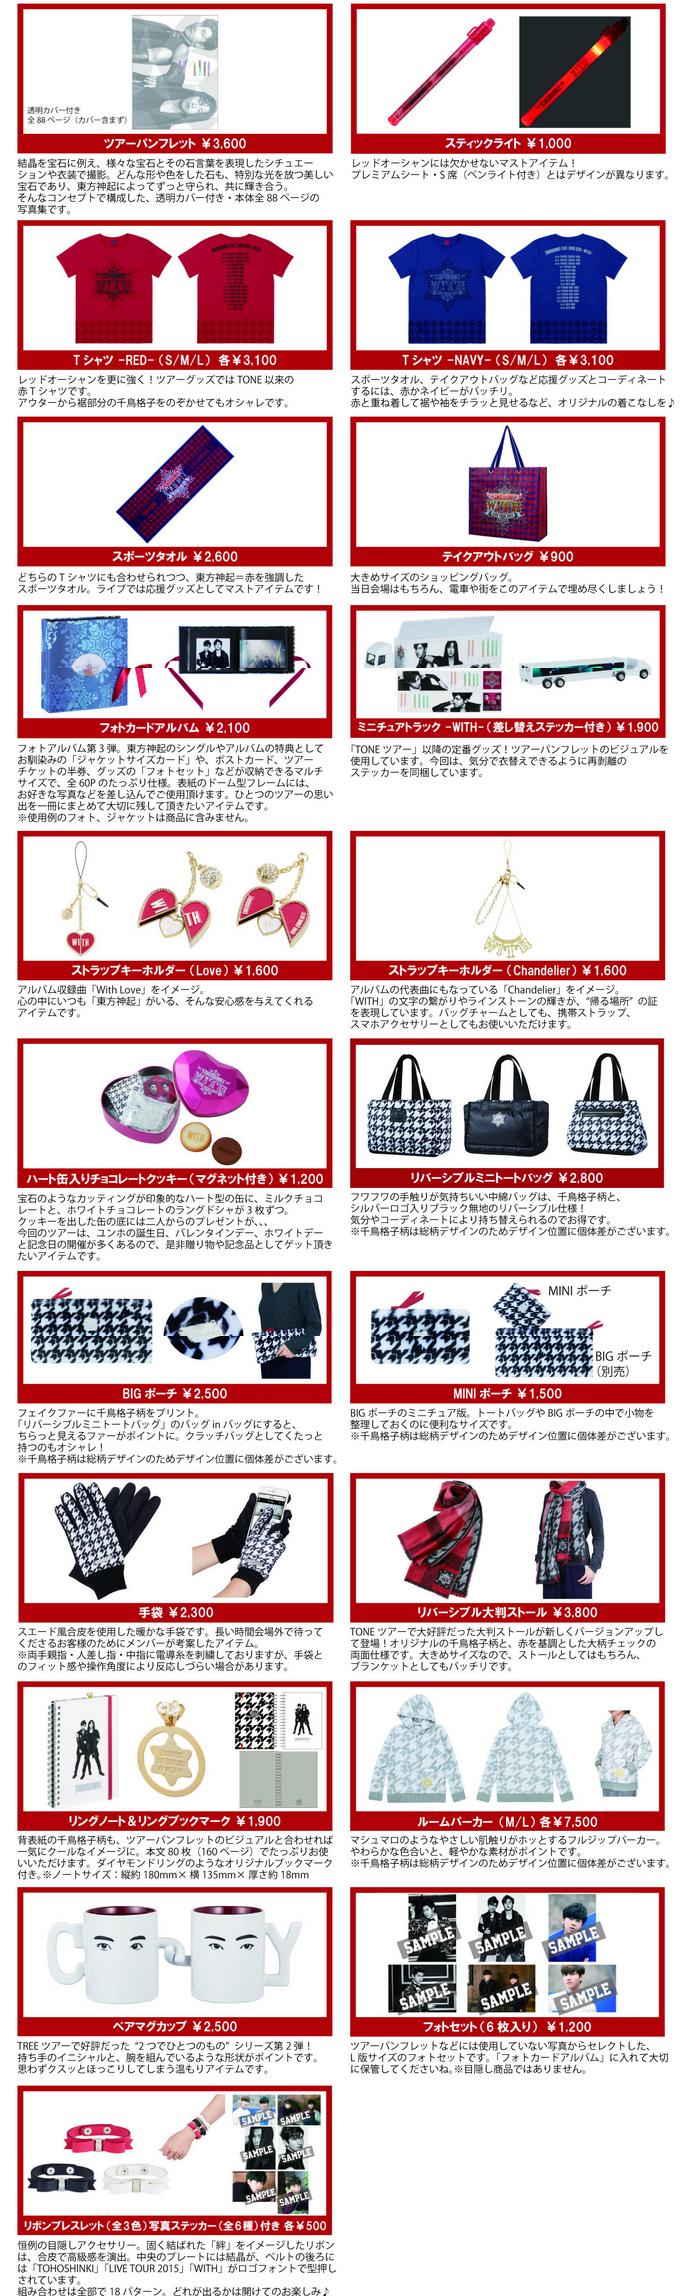 INFORMATION   東方神起 オフィシャルウェブサイト